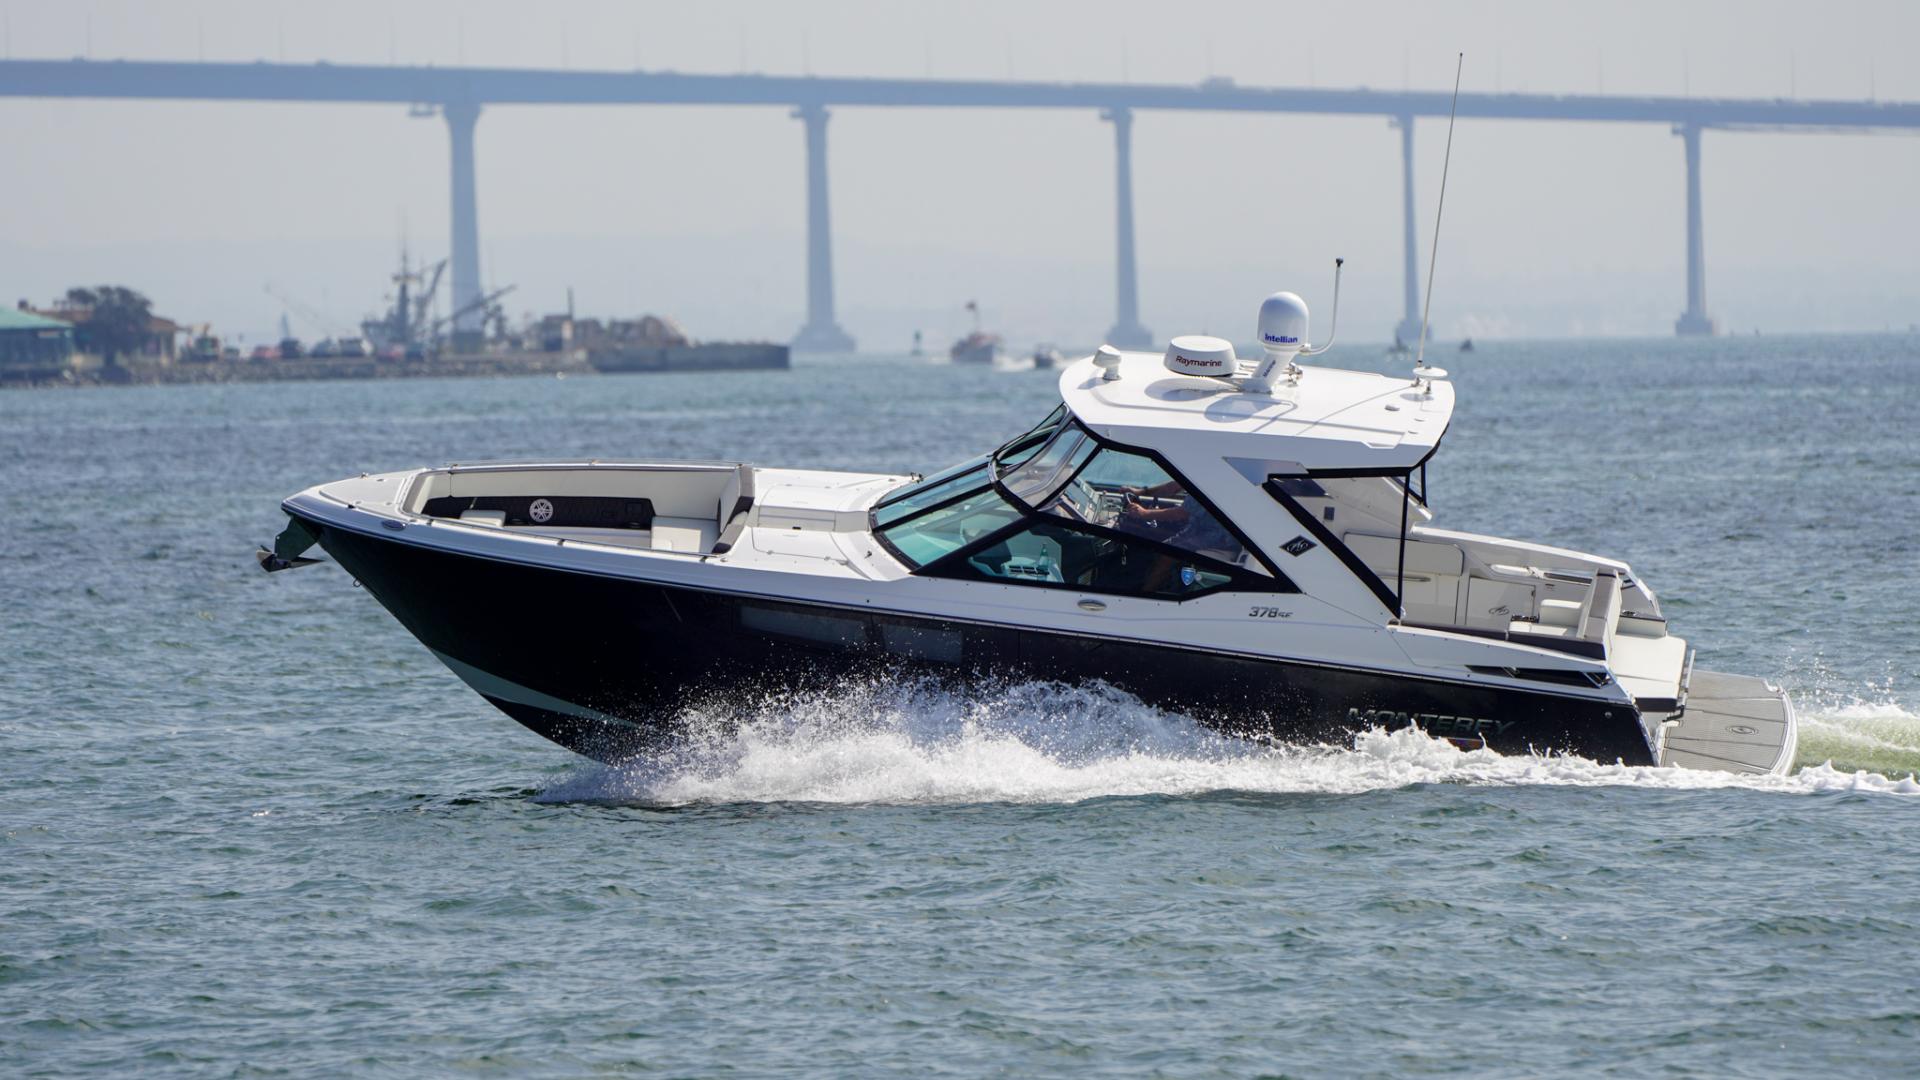 Monterey-378SE 2019-MATONE IV California-United States-EXTERIOR-1511157   Thumbnail